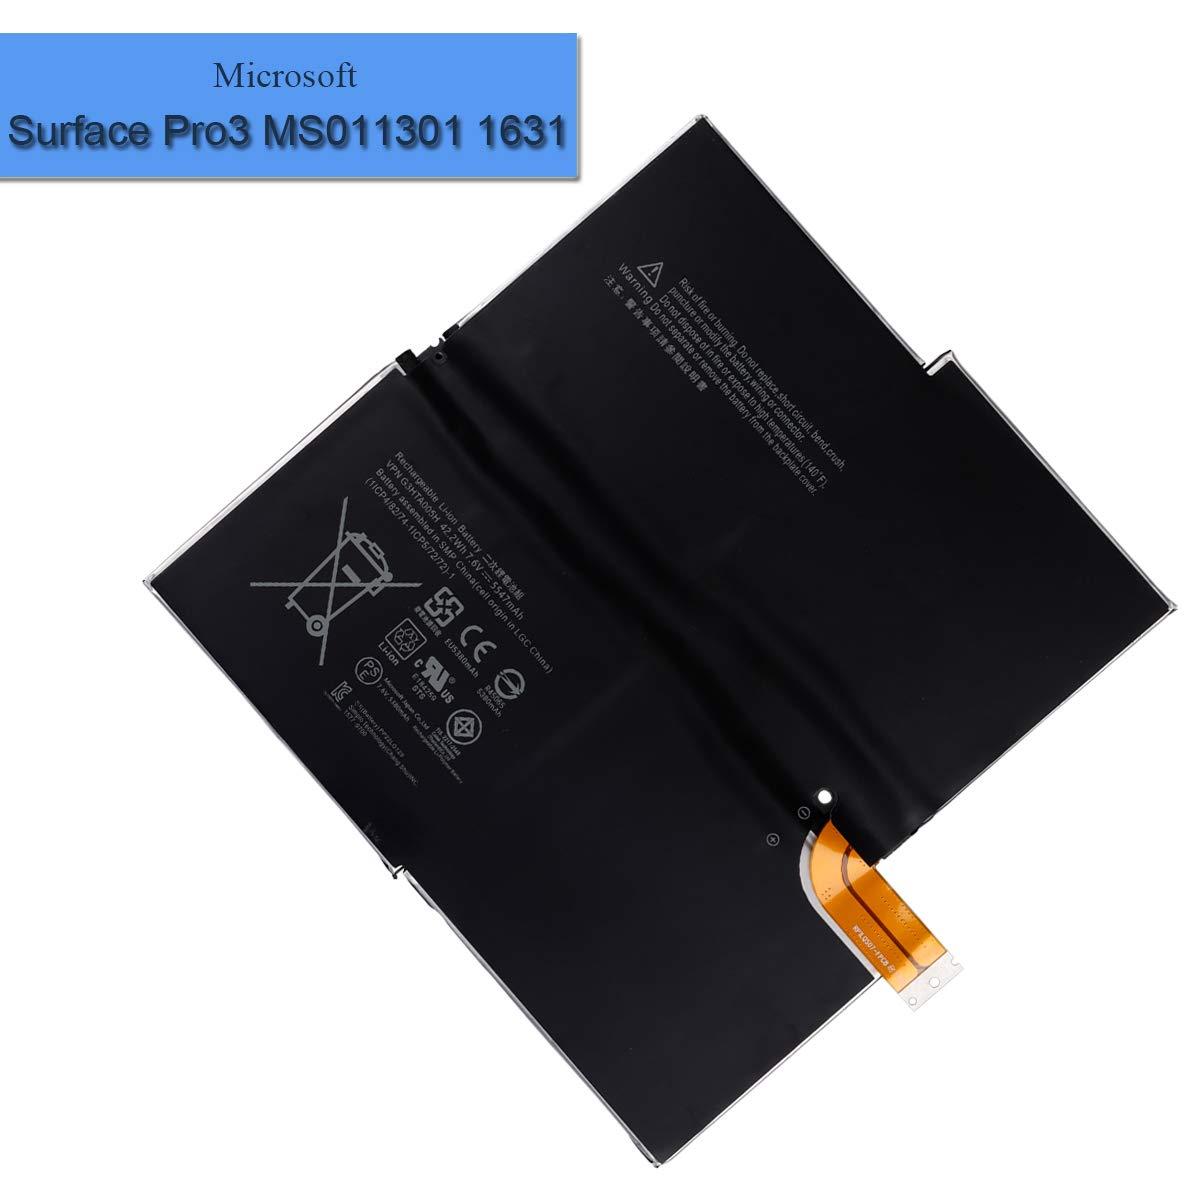 Bateria G3HTA005H Microsoft Surface Pro3 MS011301 1631 1ICP4